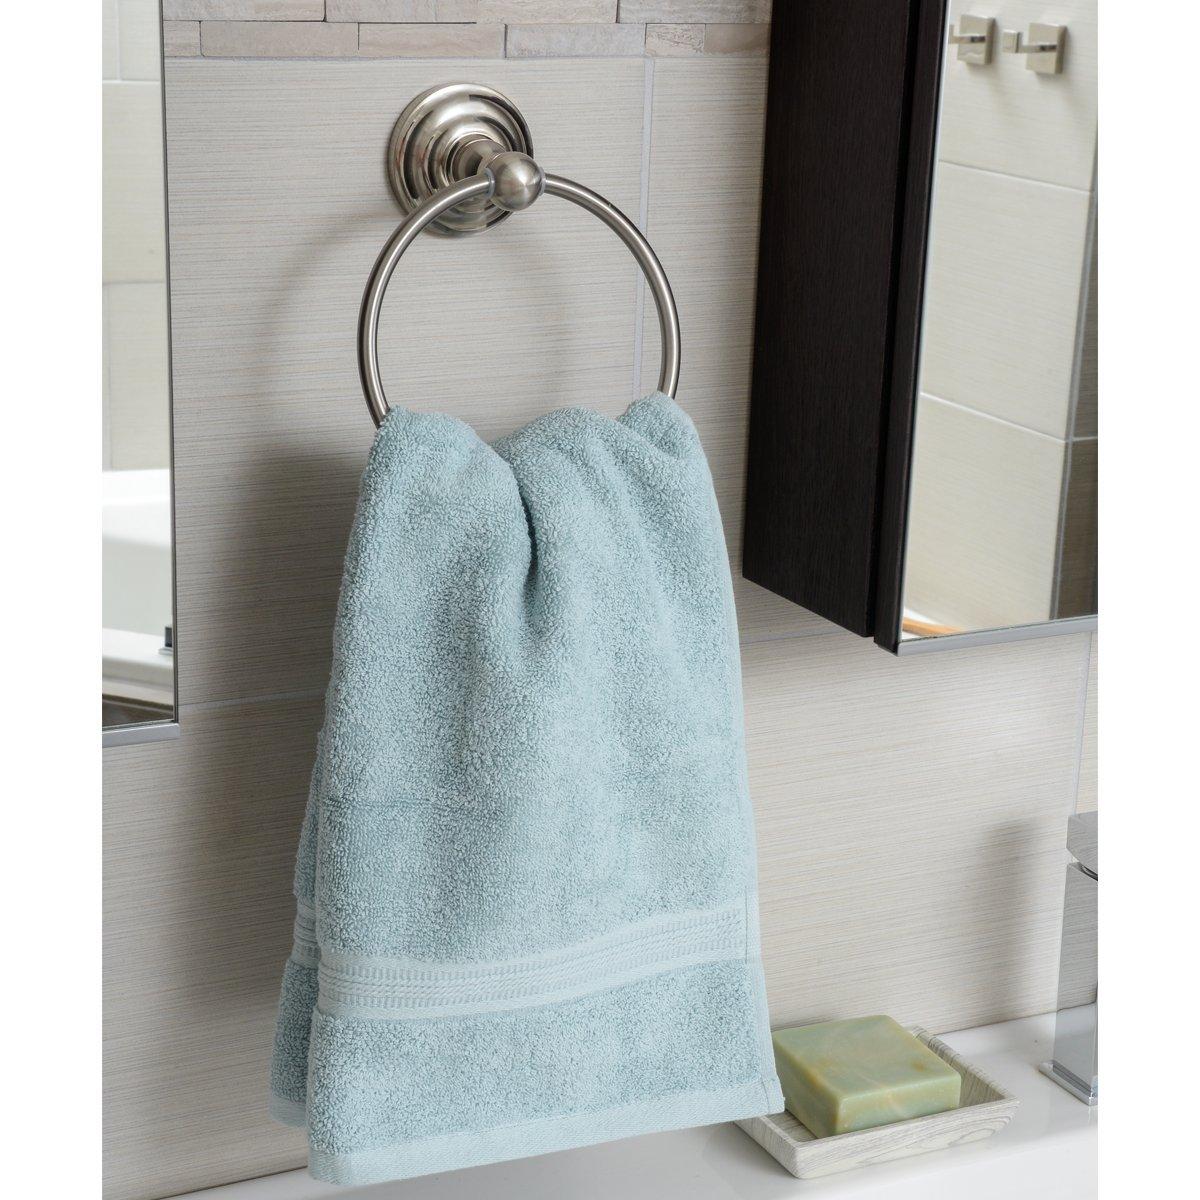 Oil Rubbed Bronze Basics Modern Towel Ring